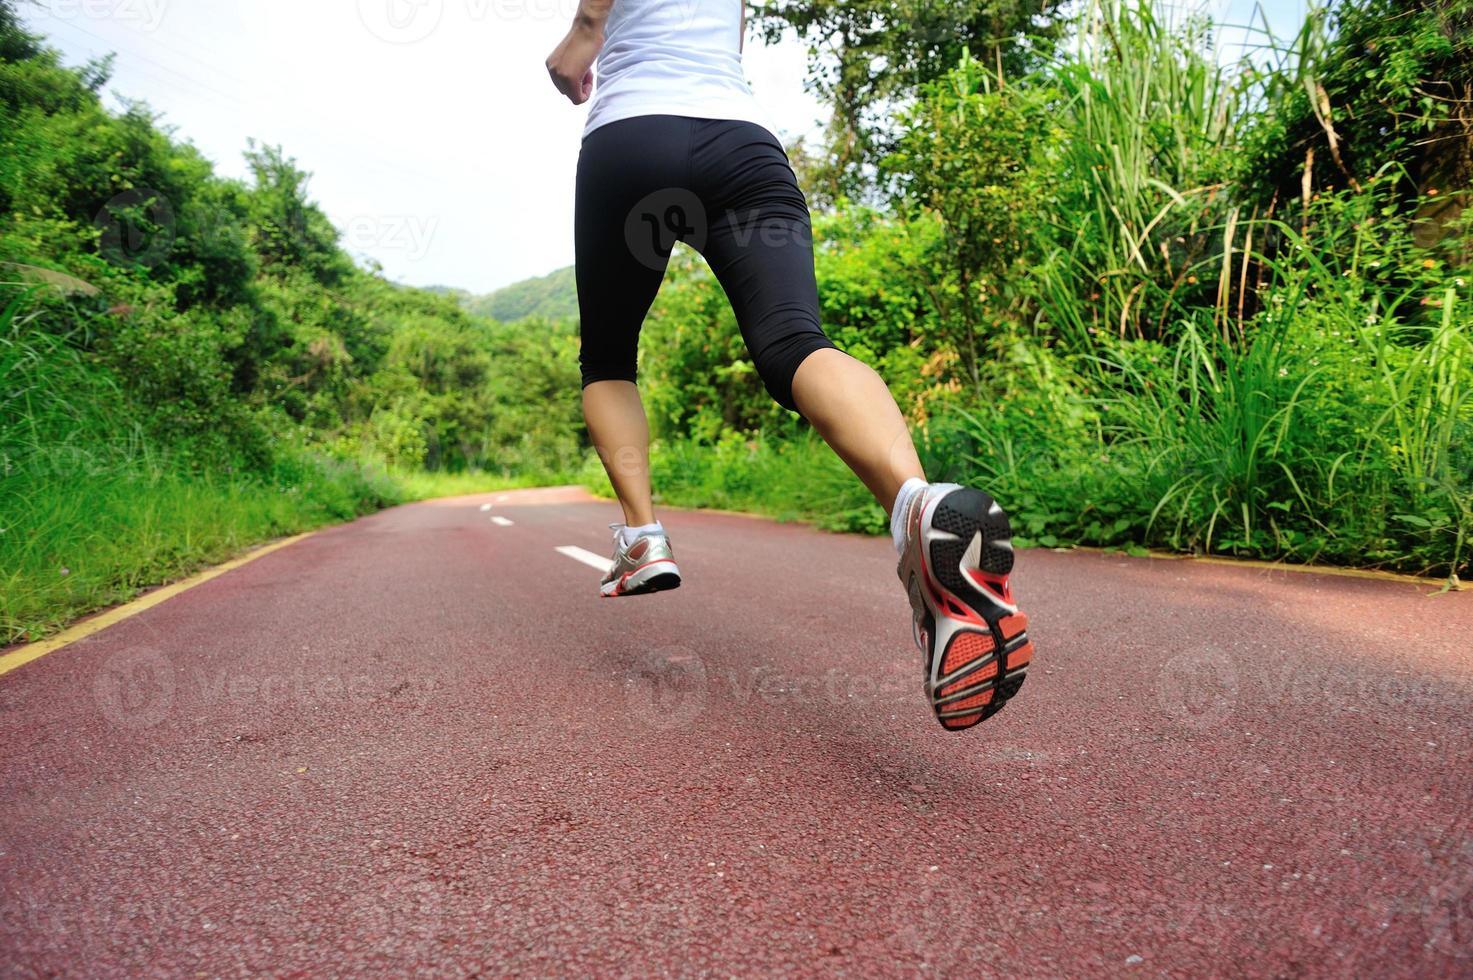 pernas de atleta corredor foto